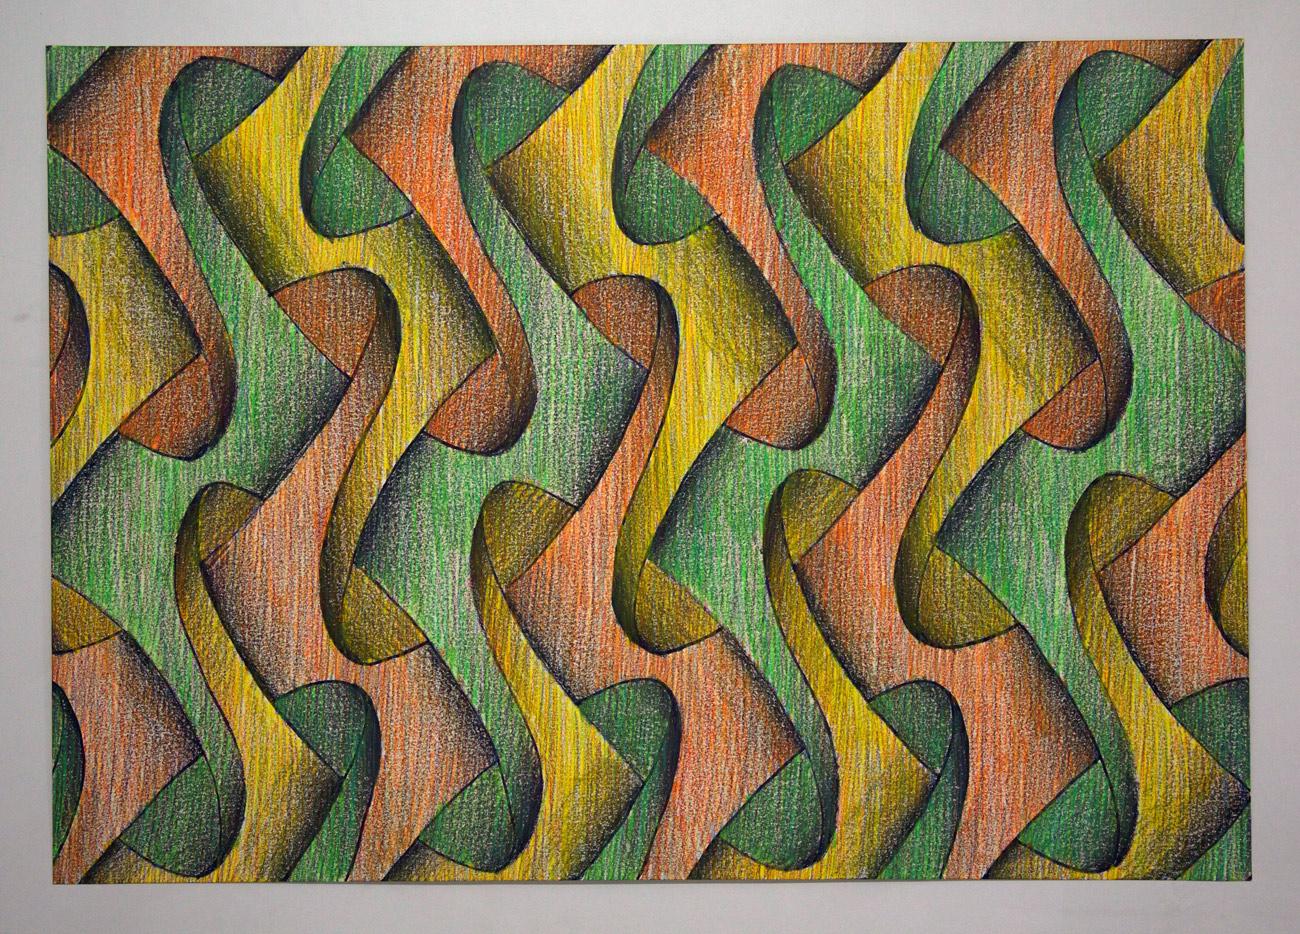 Sam Porritt, Emperors New Clothes, 2016. Brush, ink, wax crayon on paper. 100 x 70 cm.